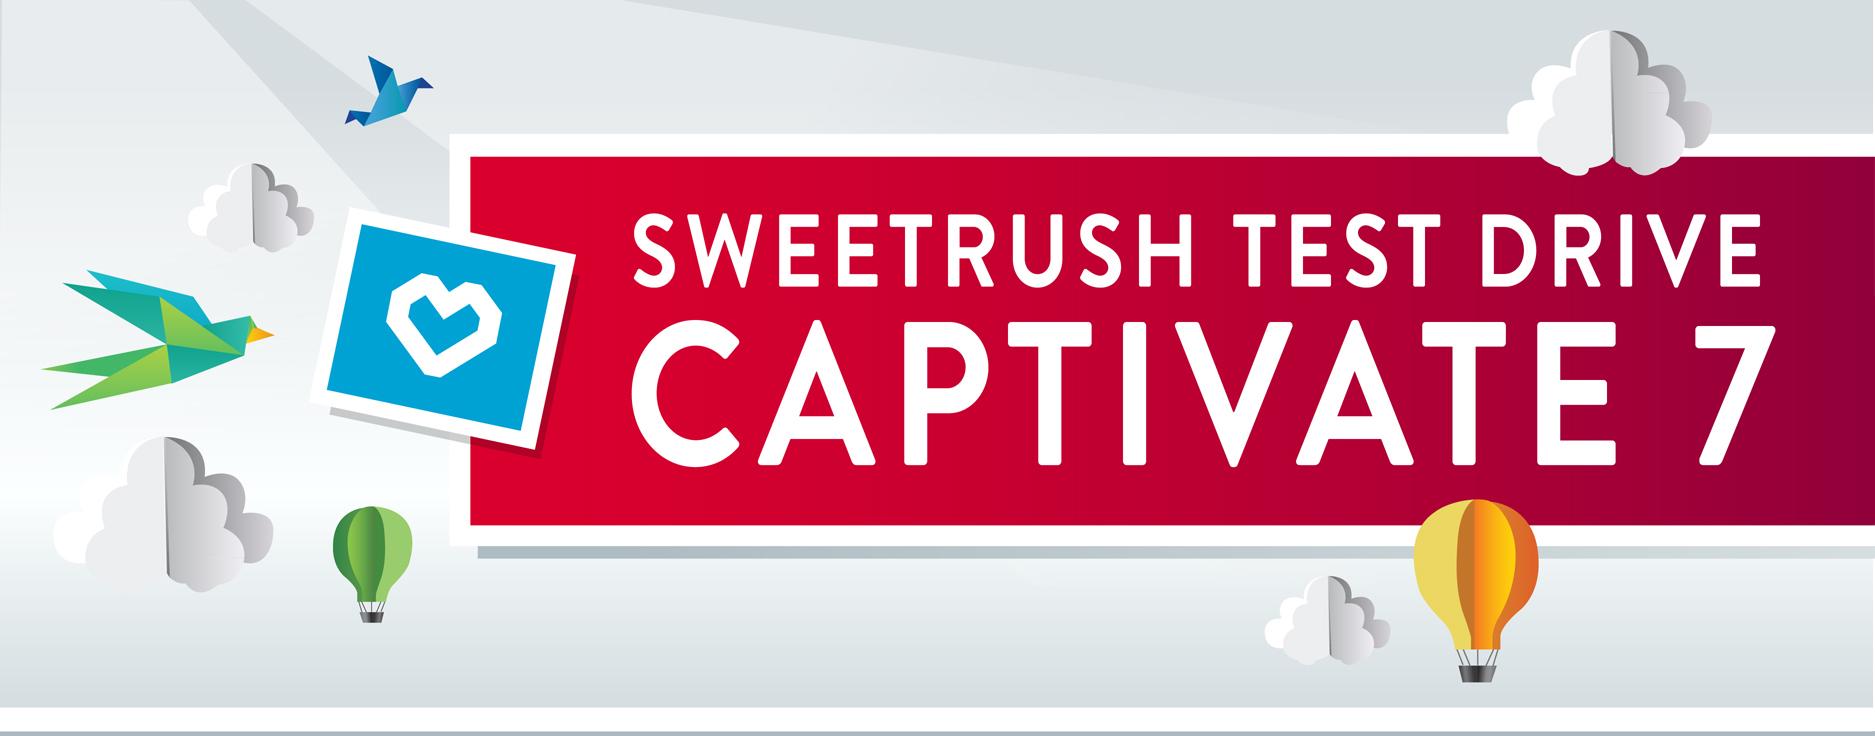 SweetRush Test Drive Captivate 7